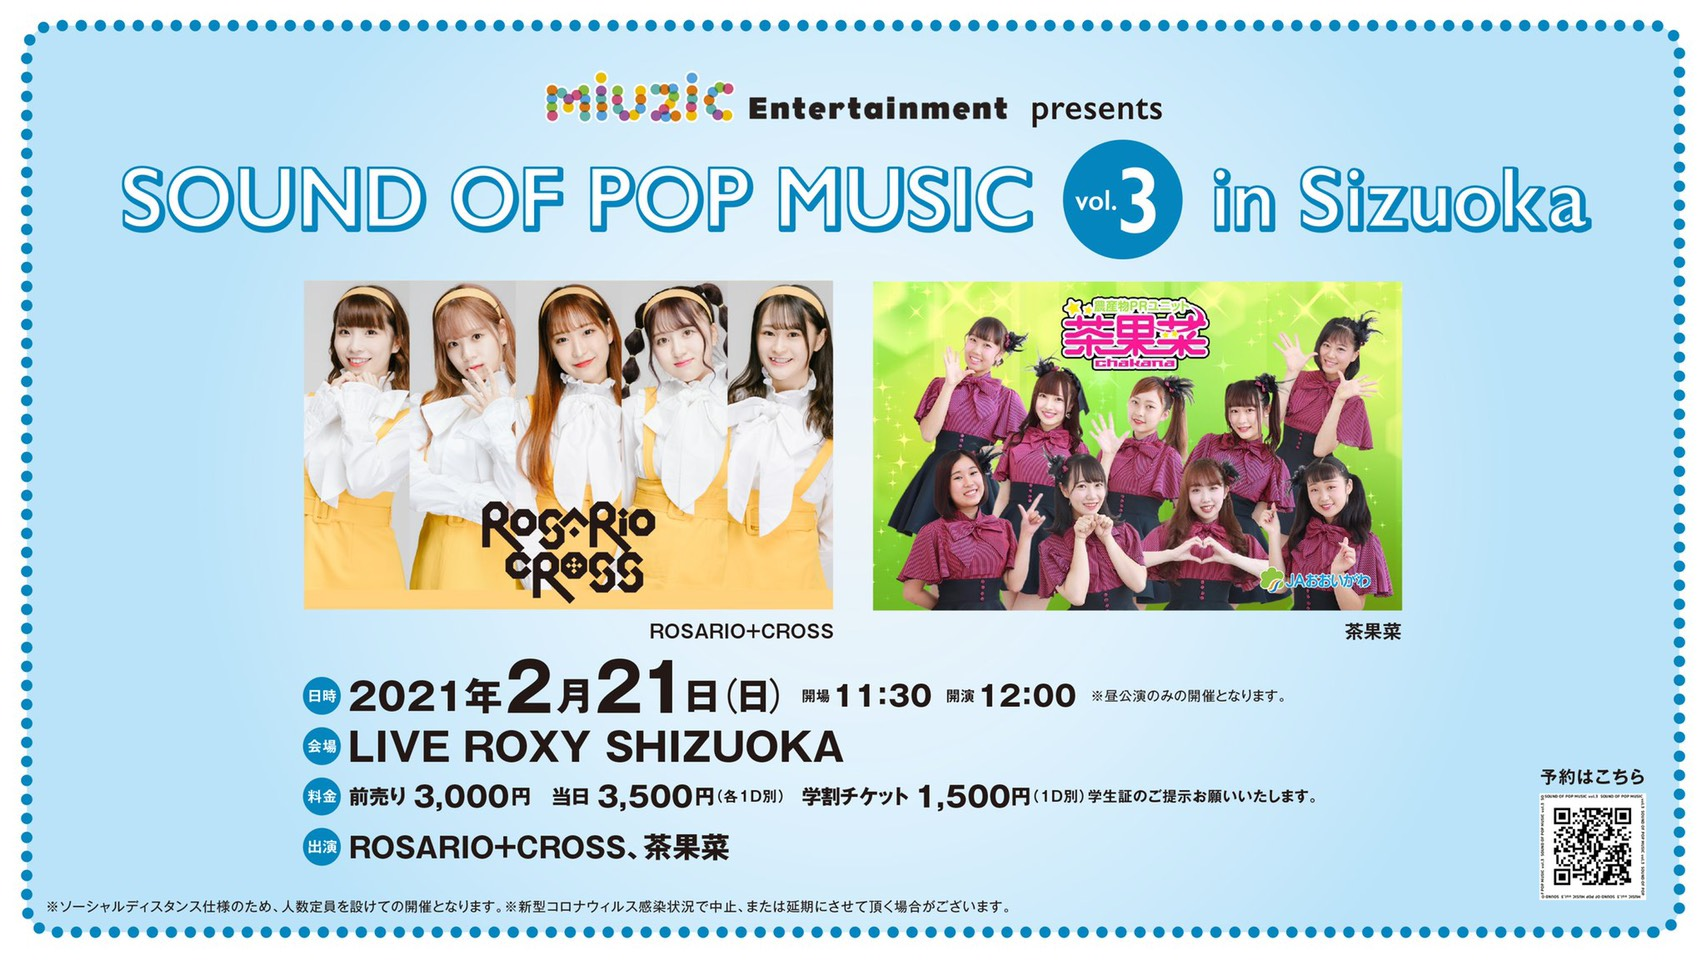 miuzic Entertainment presents 「SOUND OF POP MUSIC vol.3 in Shizuoka」